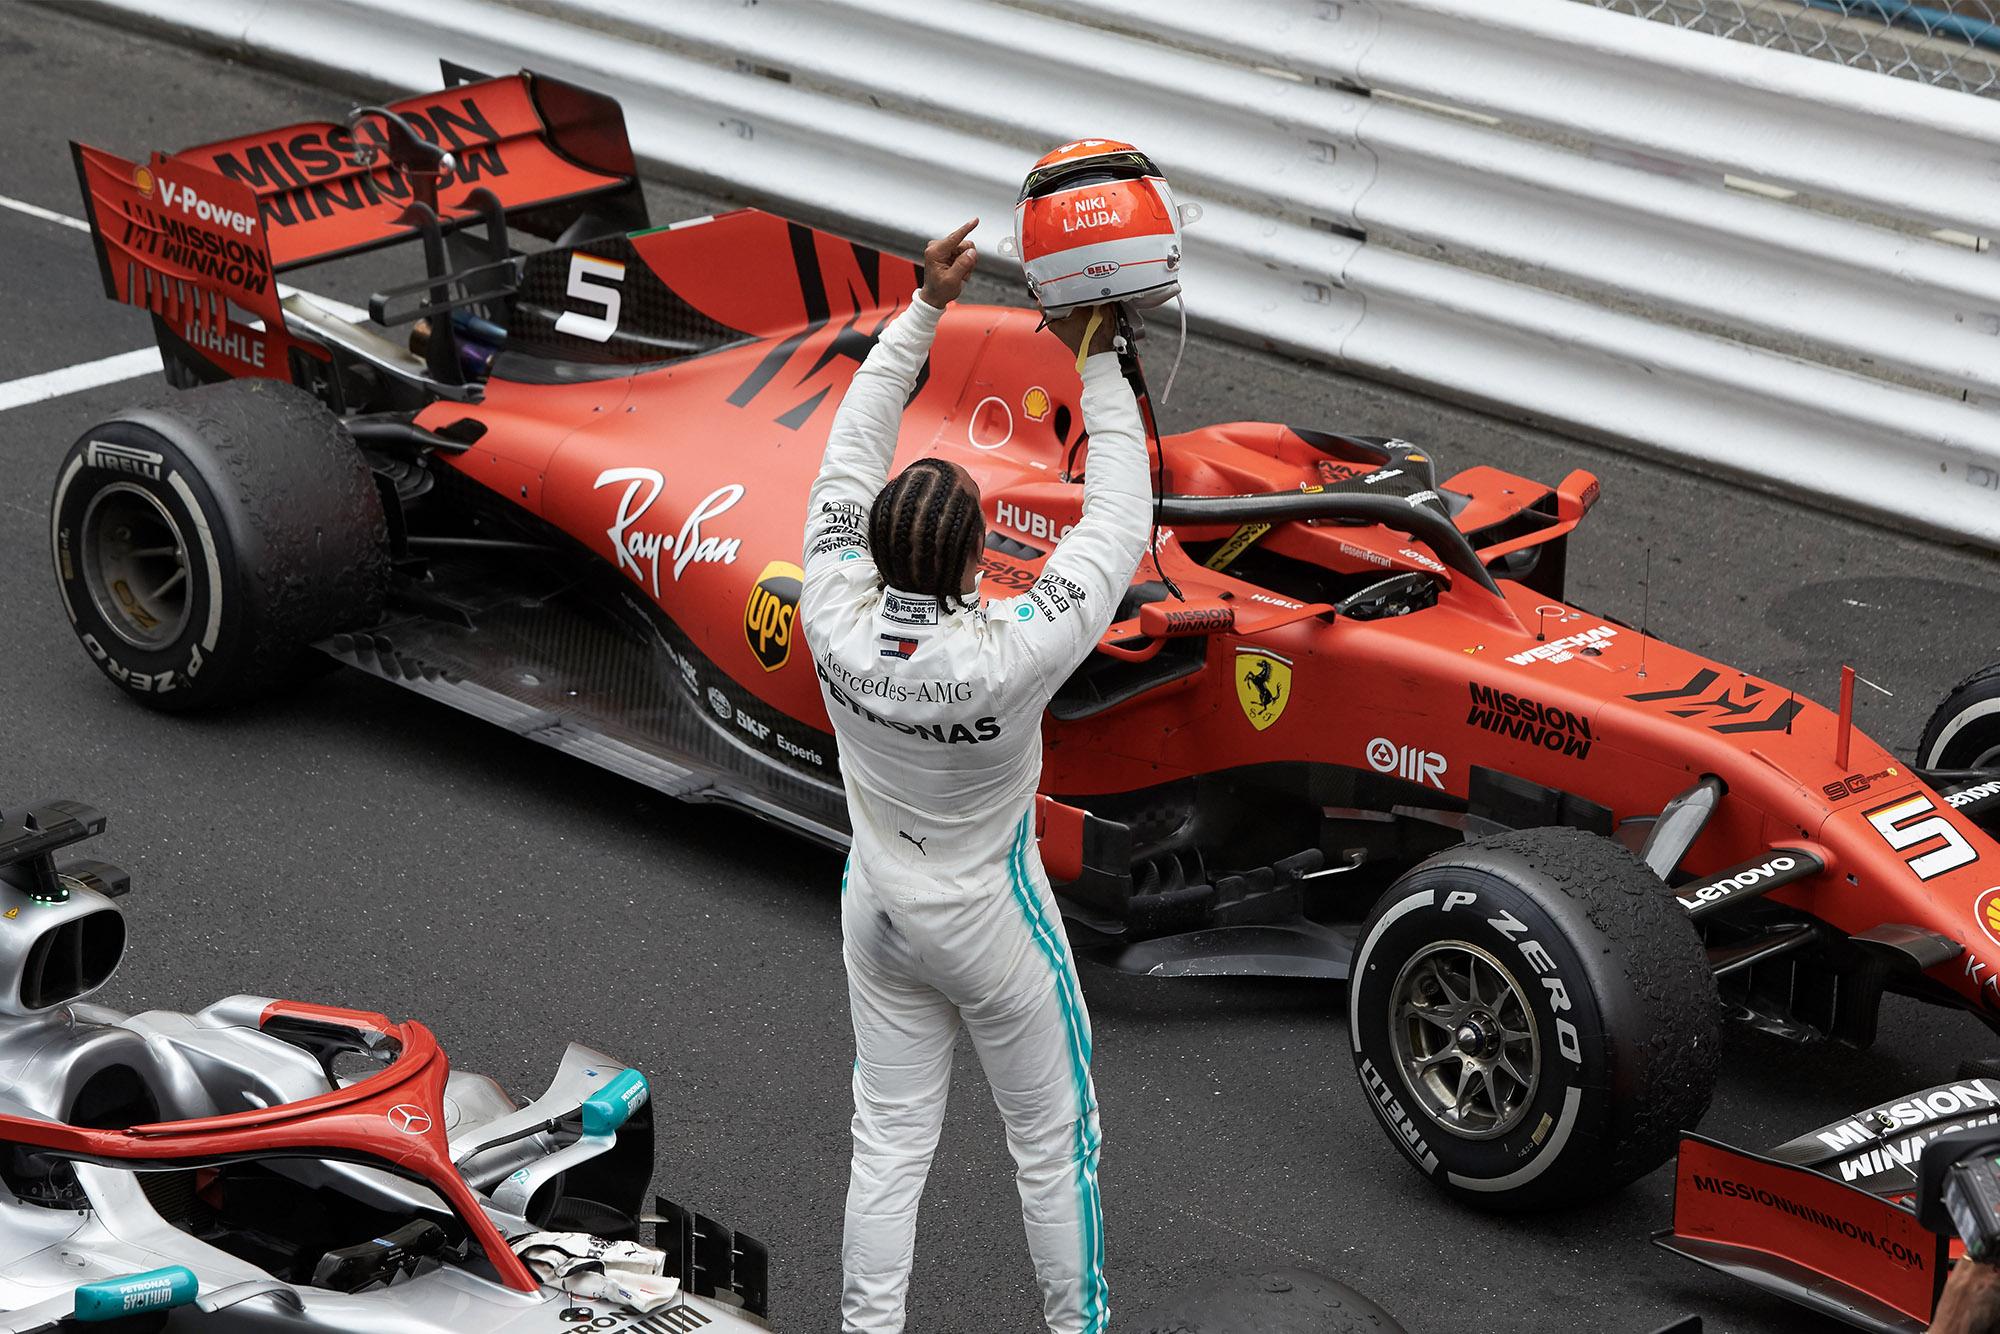 Lewis Hamilton after winning the Monaco Grand Prix